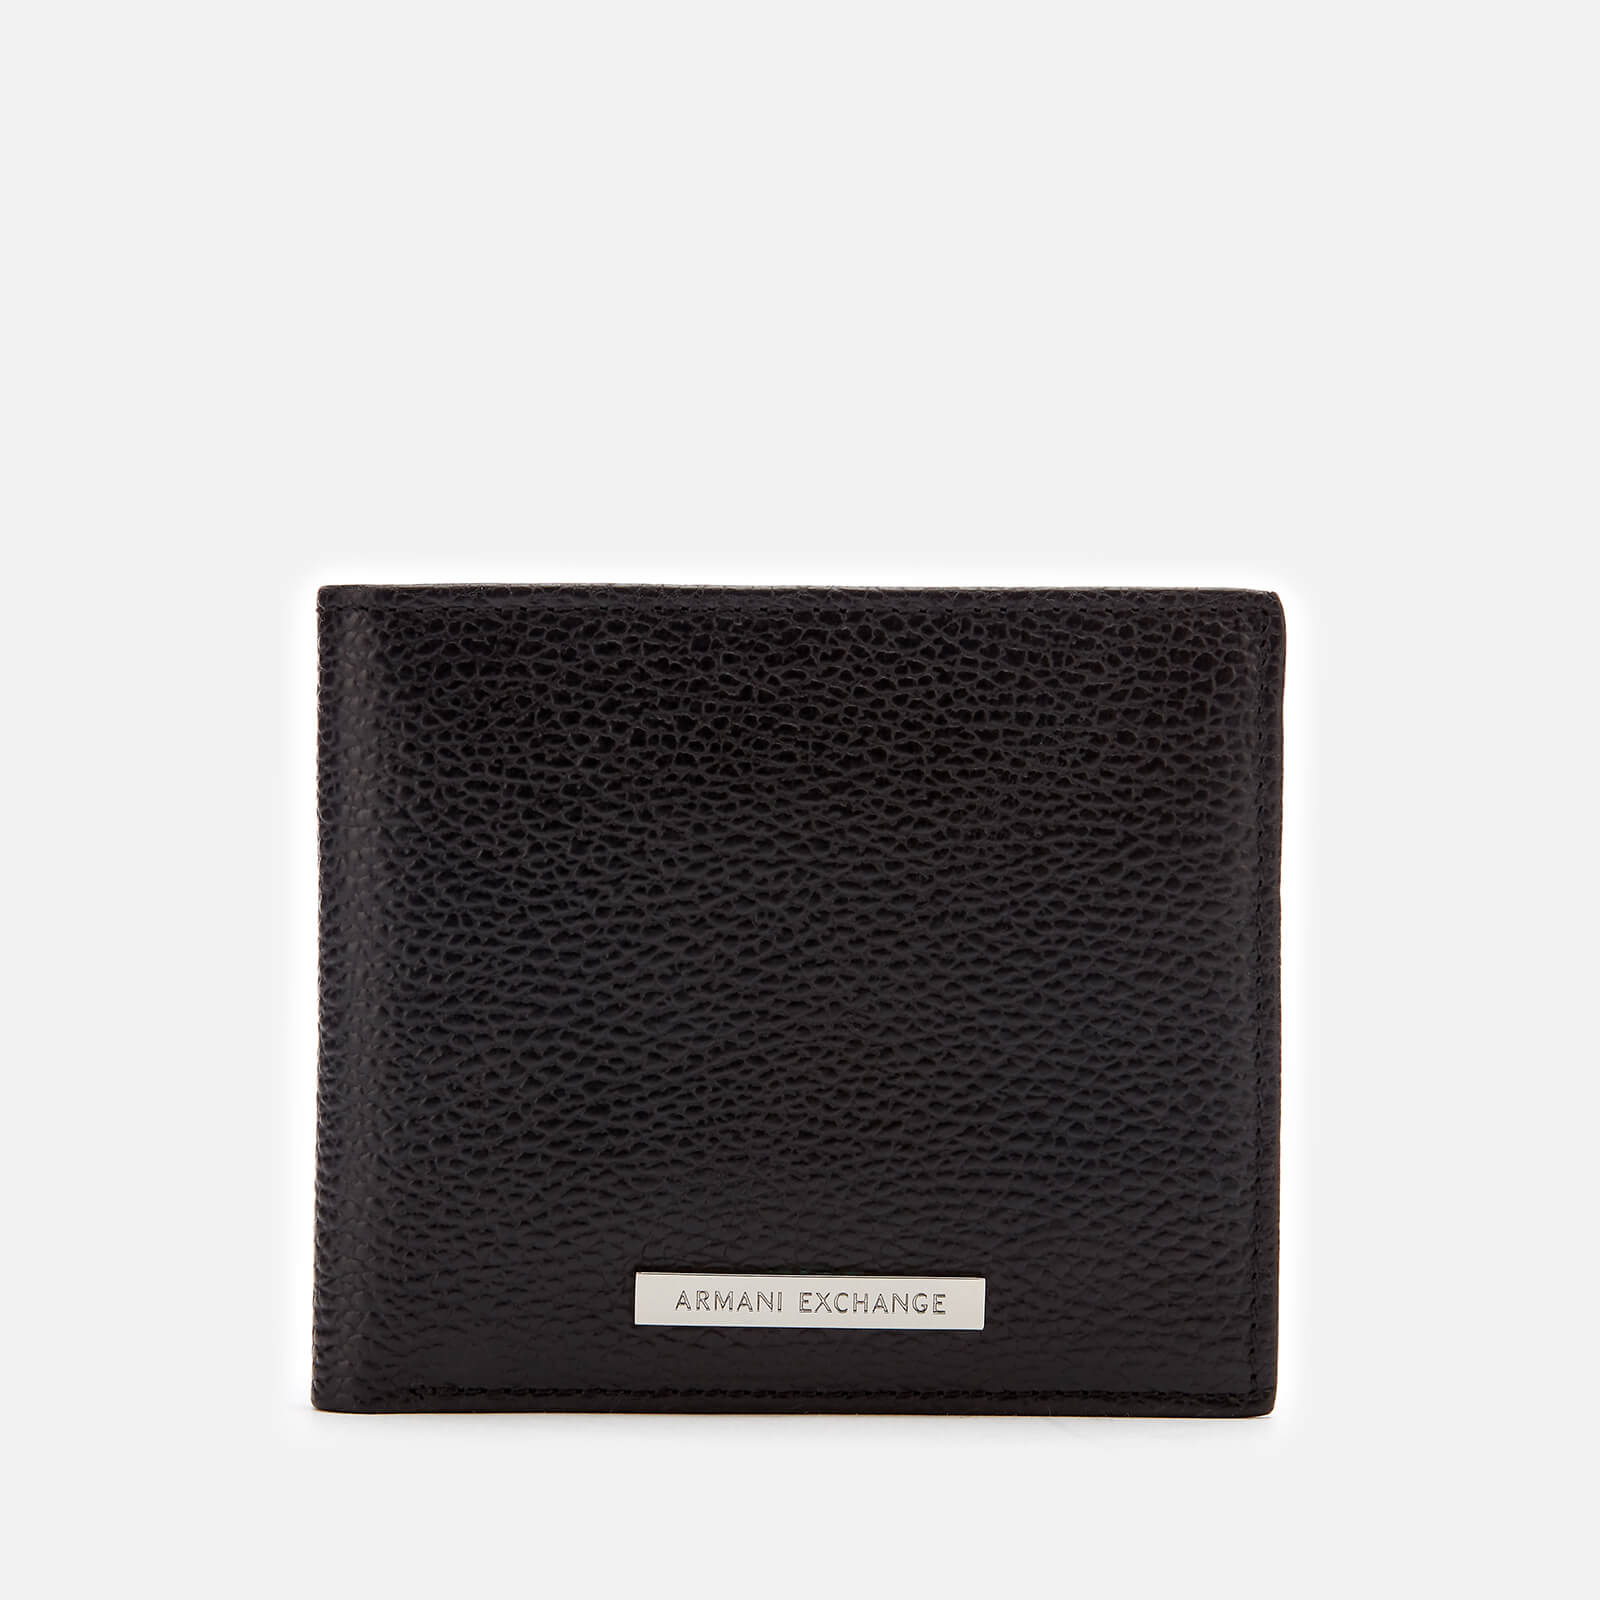 Armani Exchange Men's Tumbled Leather Bifold Wallet - Black